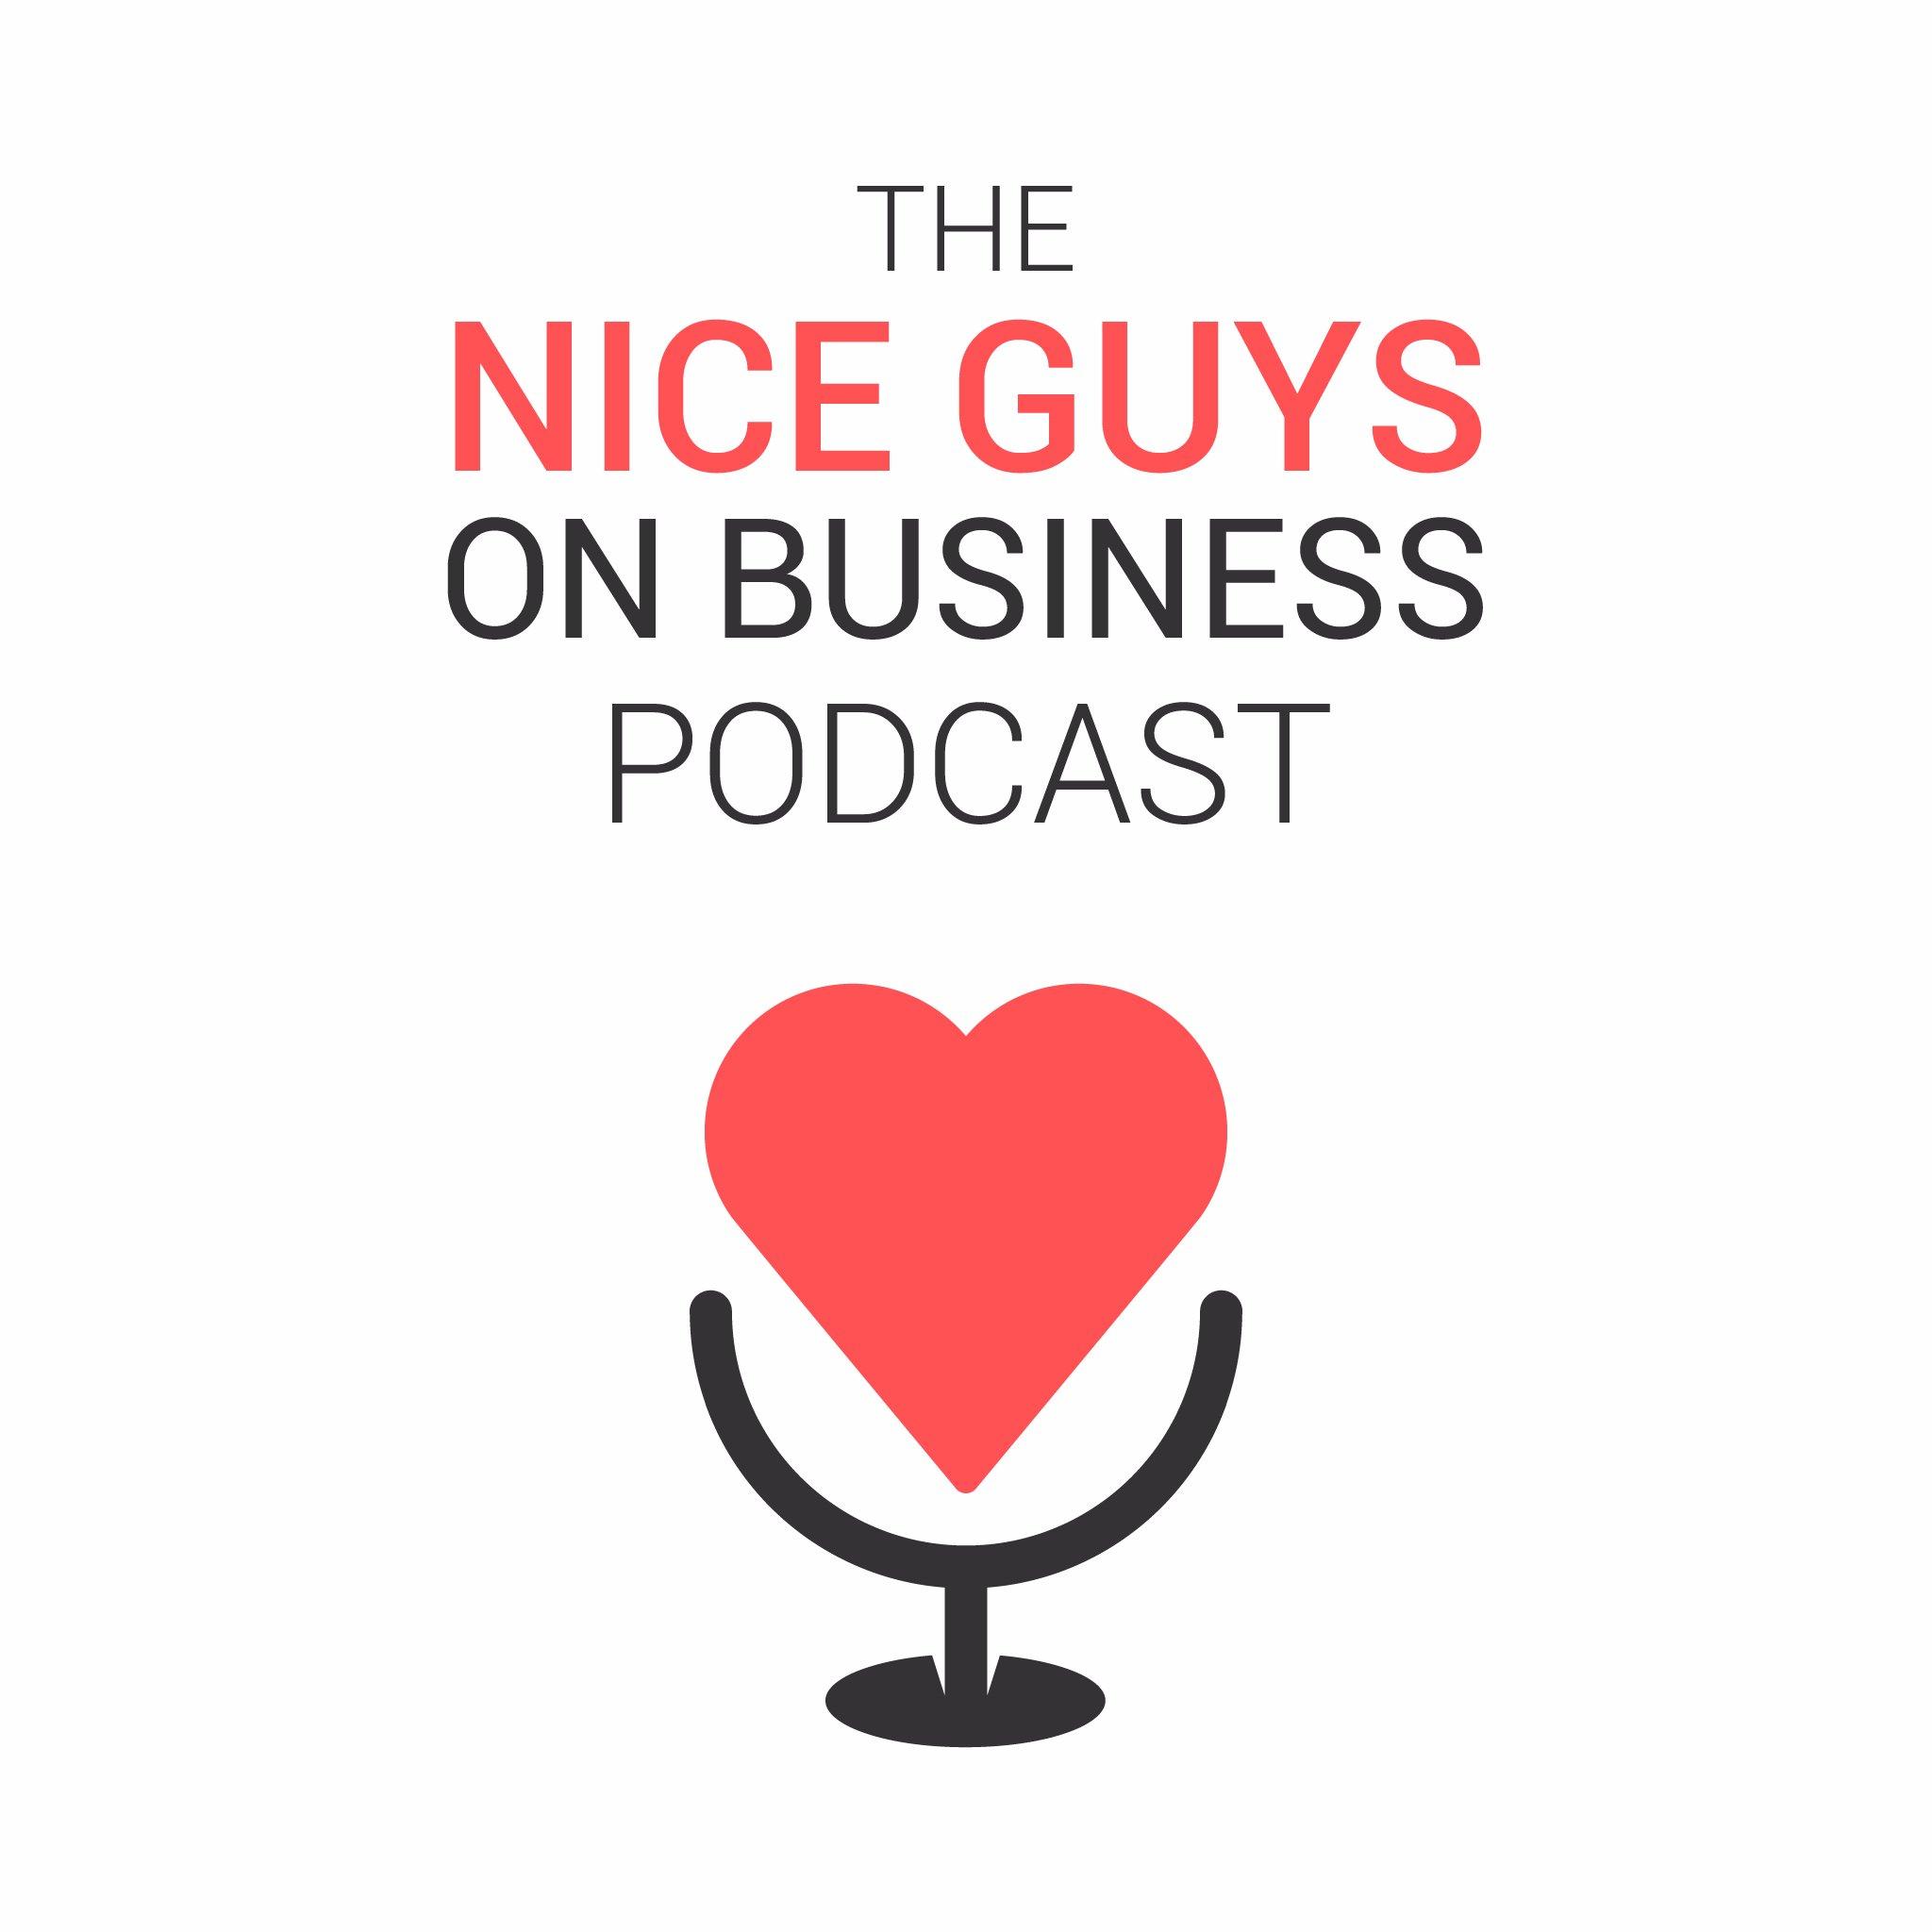 The Nice Guys on Business